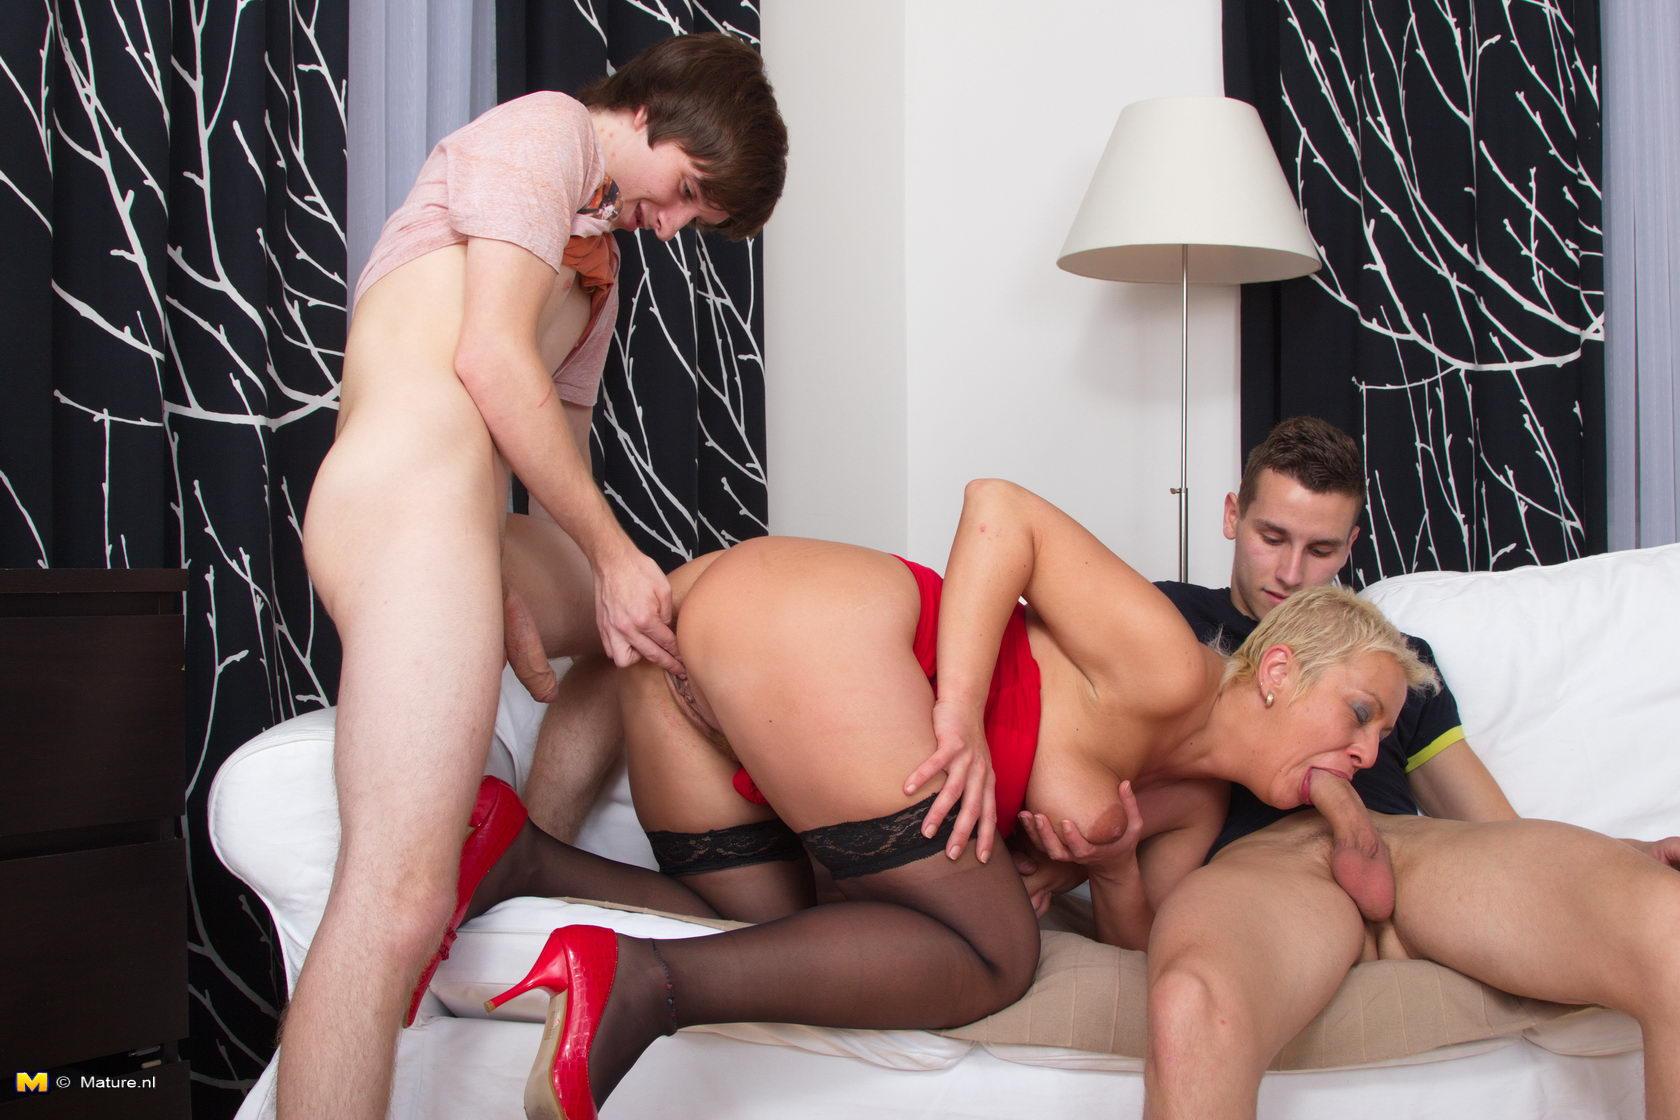 Гиг порно со взрослыми